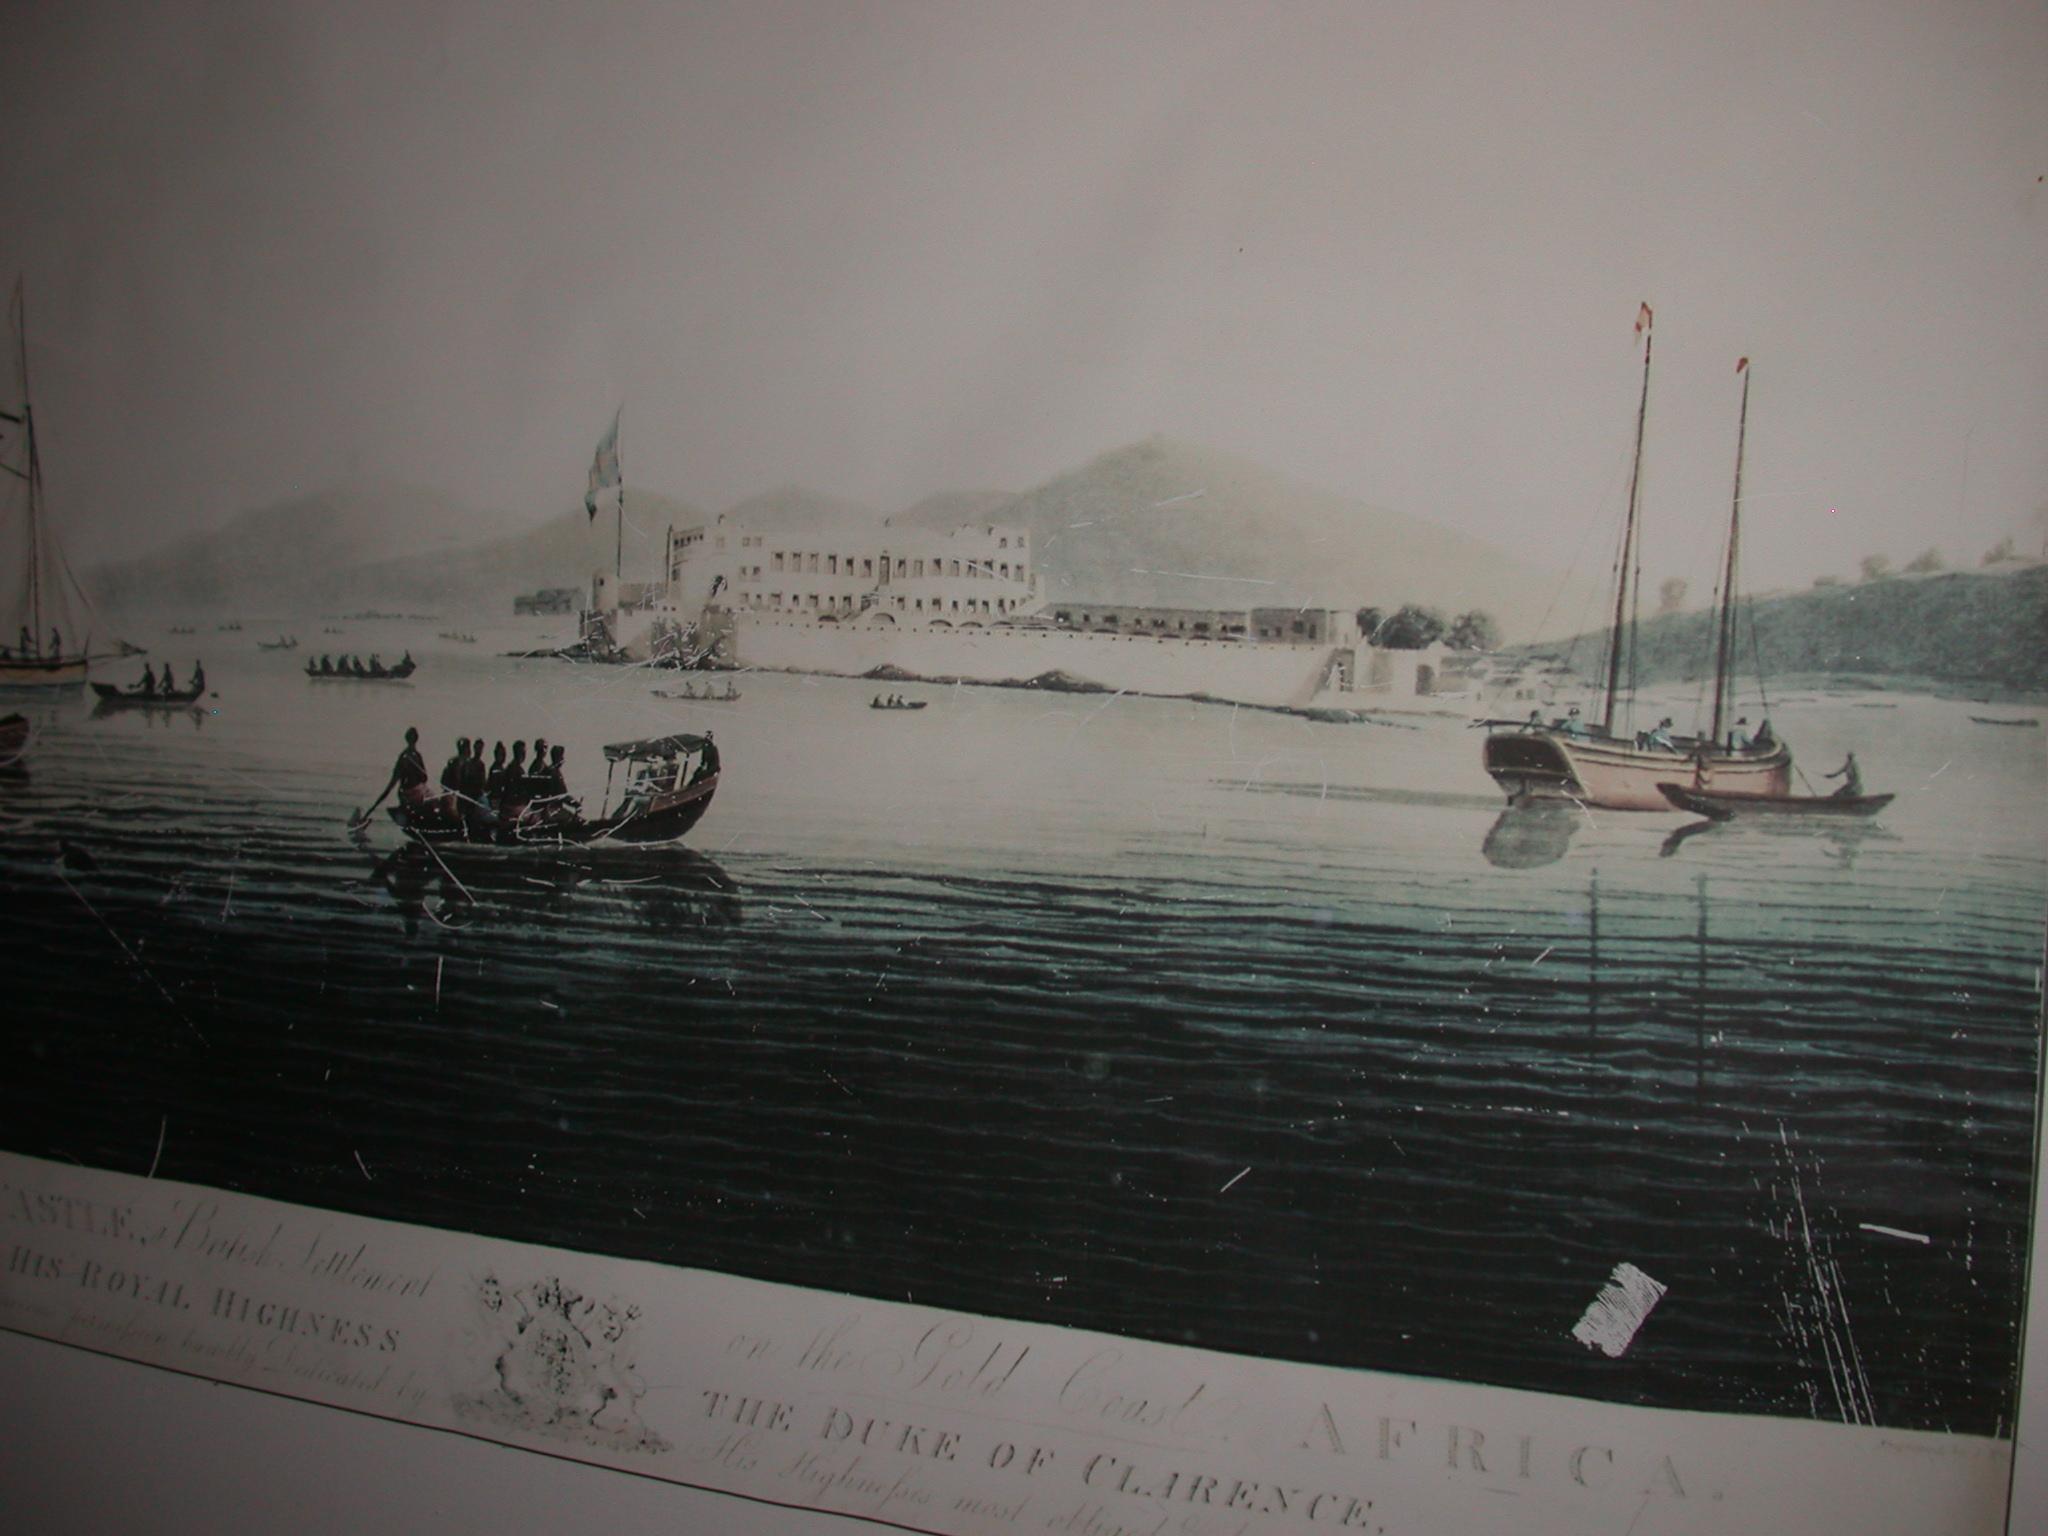 Cape Coast Castle Engraving, National Museum, Accra, Ghana